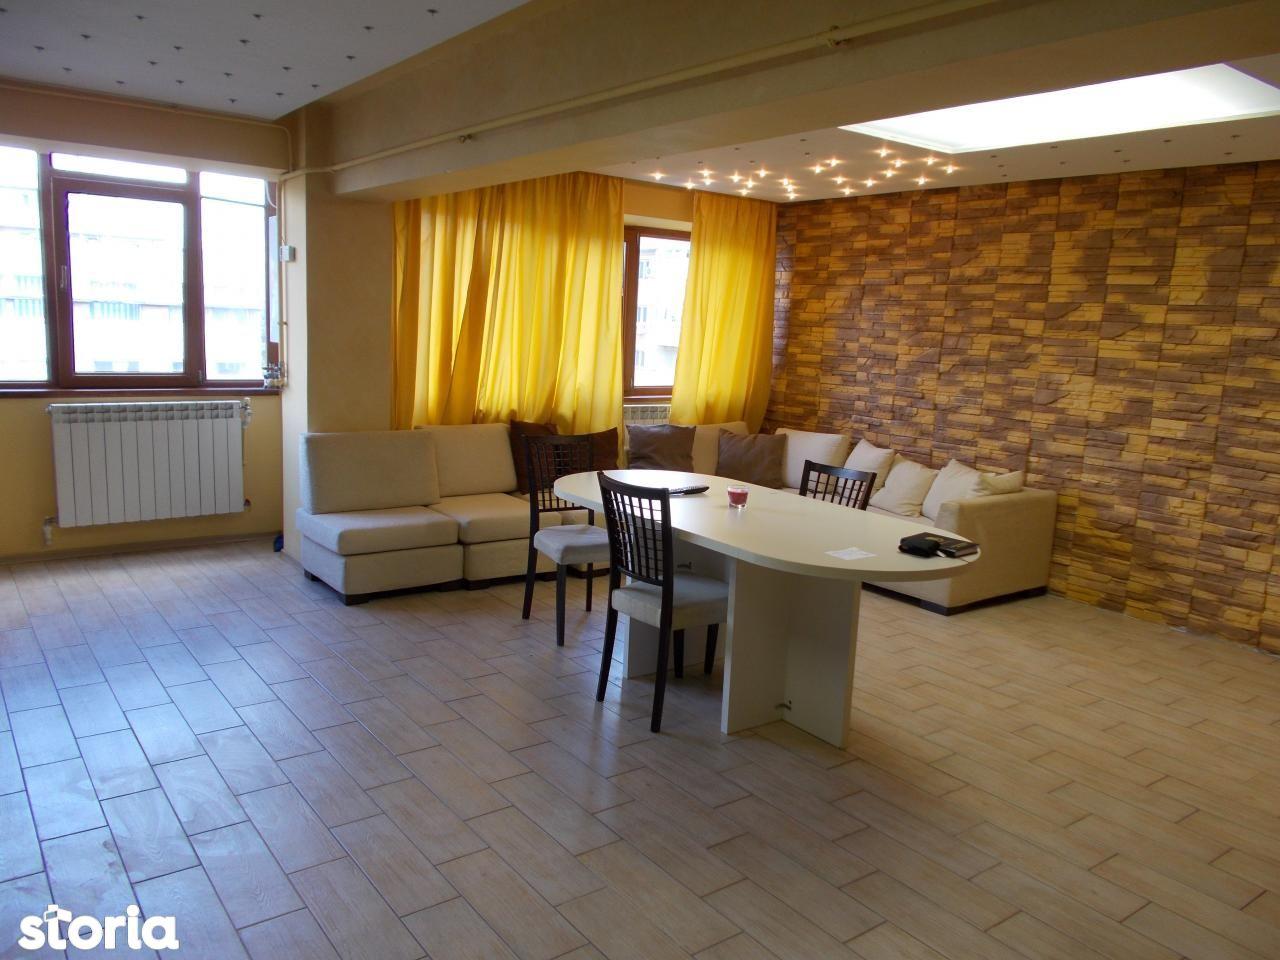 Apartament de vanzare, Brăila (judet), Cãlãrași 4 - Foto 2